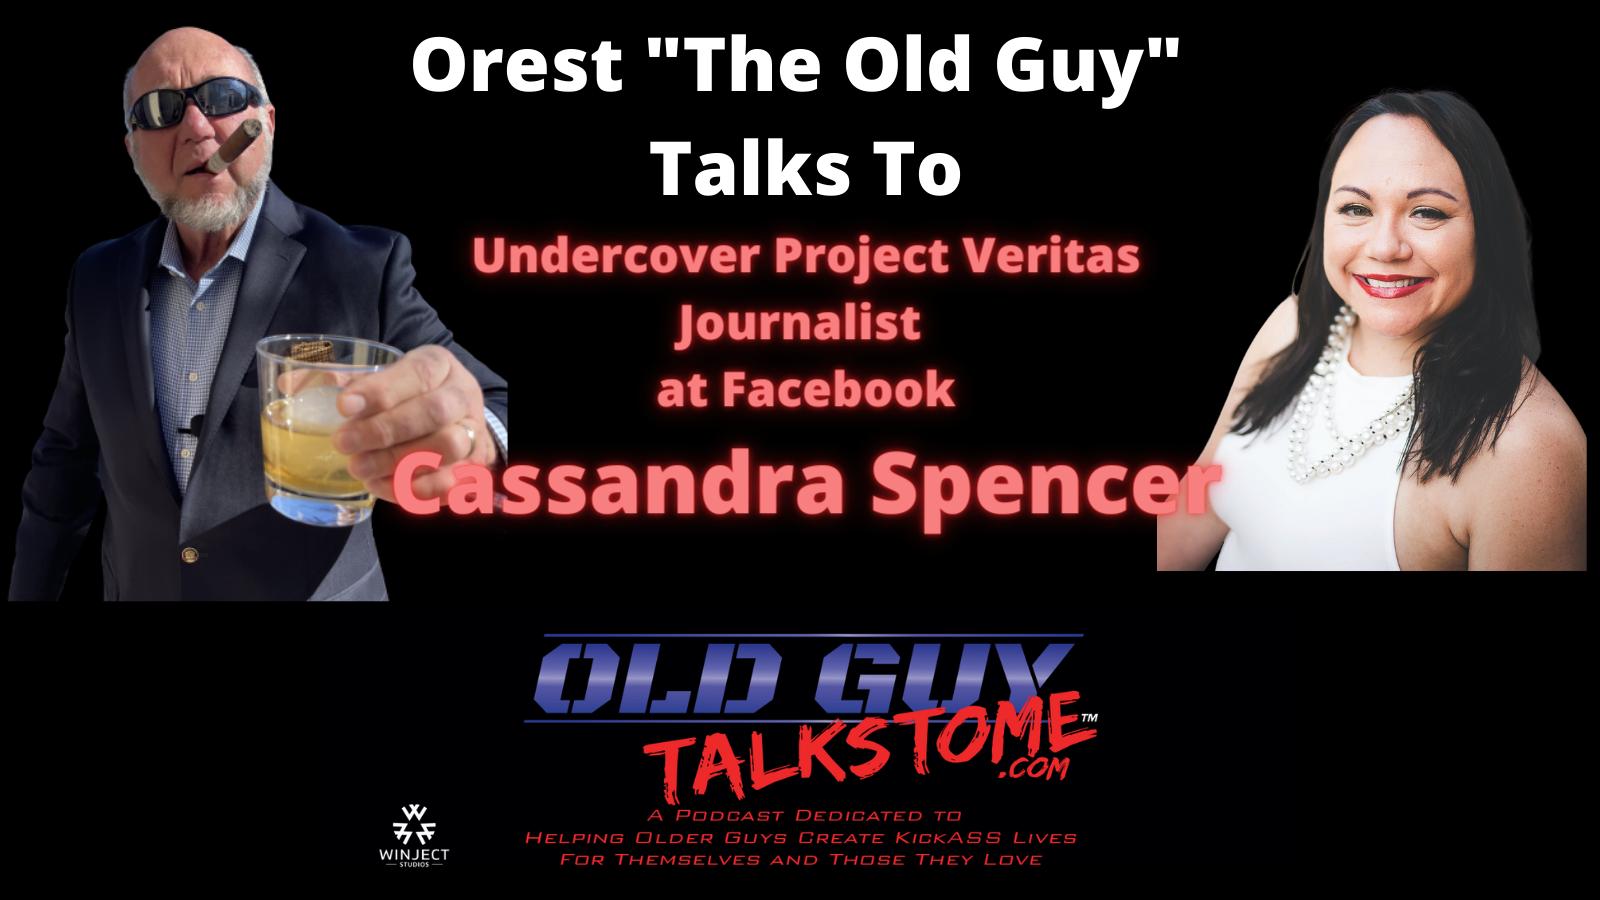 OldGuyTalksToMe - Old Guy Talks to Cassandra Spencer